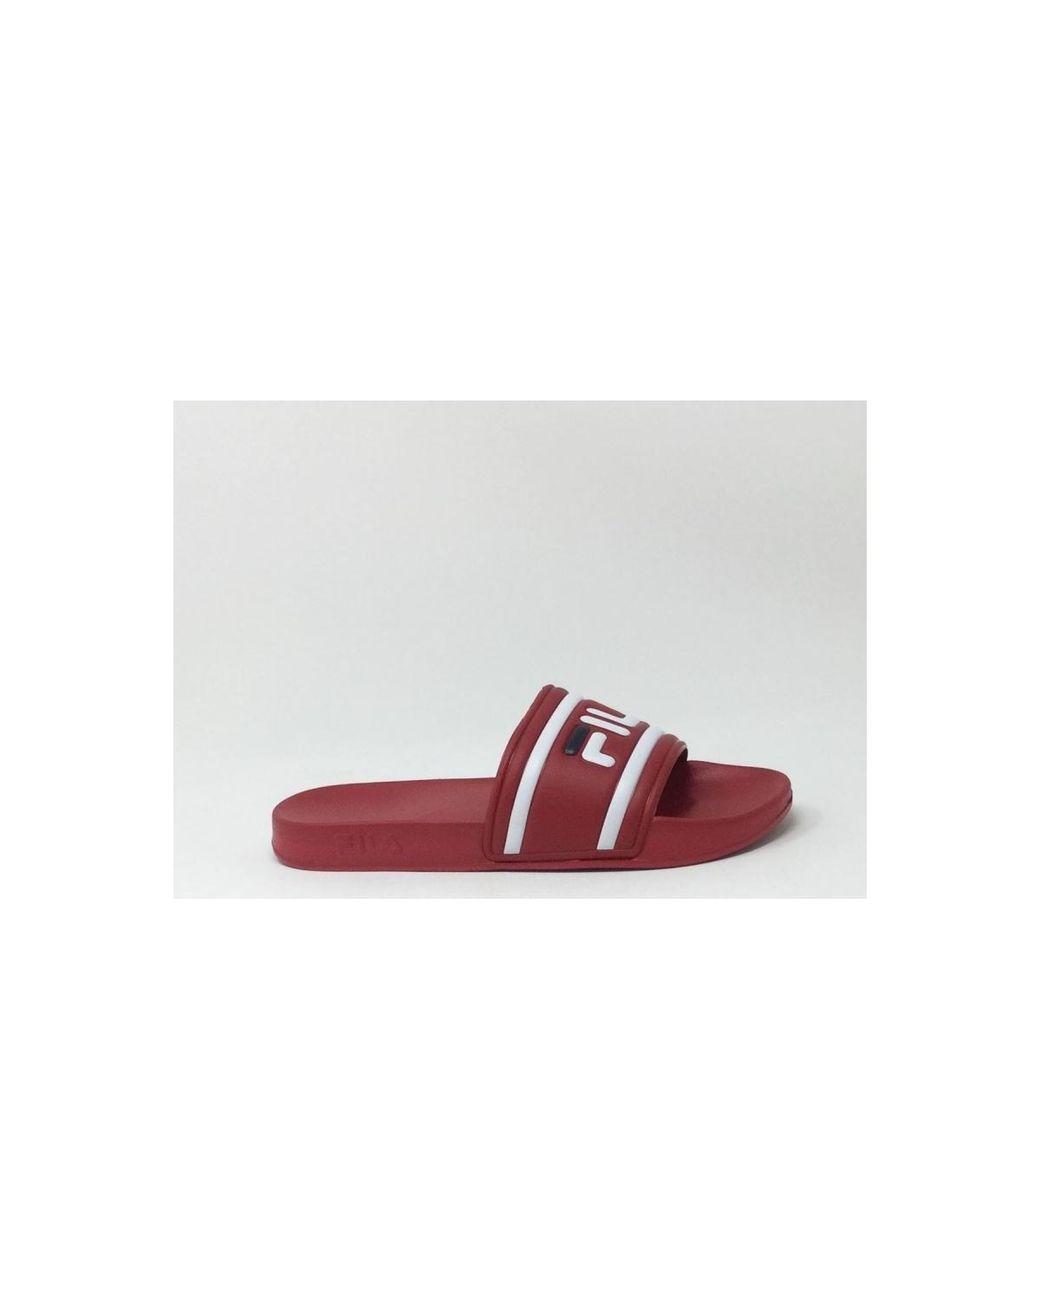 MORRO BAY SLIPPER ROUGE femmes Claquettes en rouge